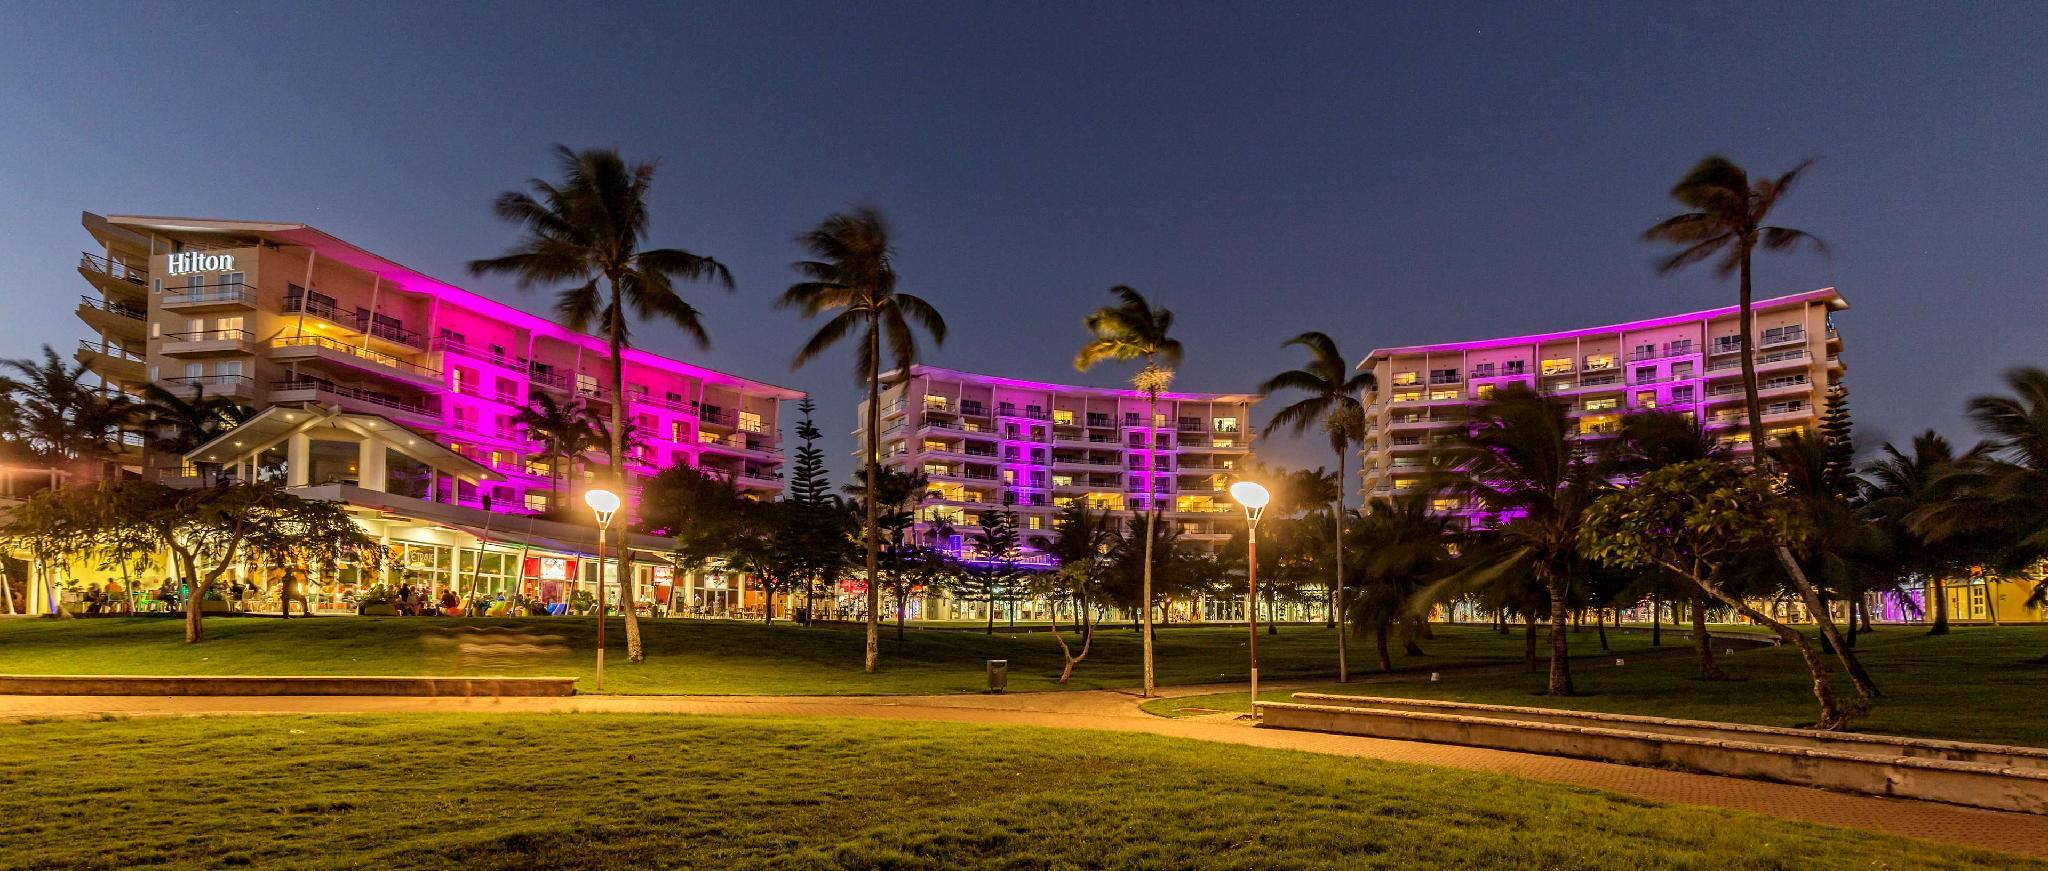 Hilton Noumea La Promenade Residences, Nouméa